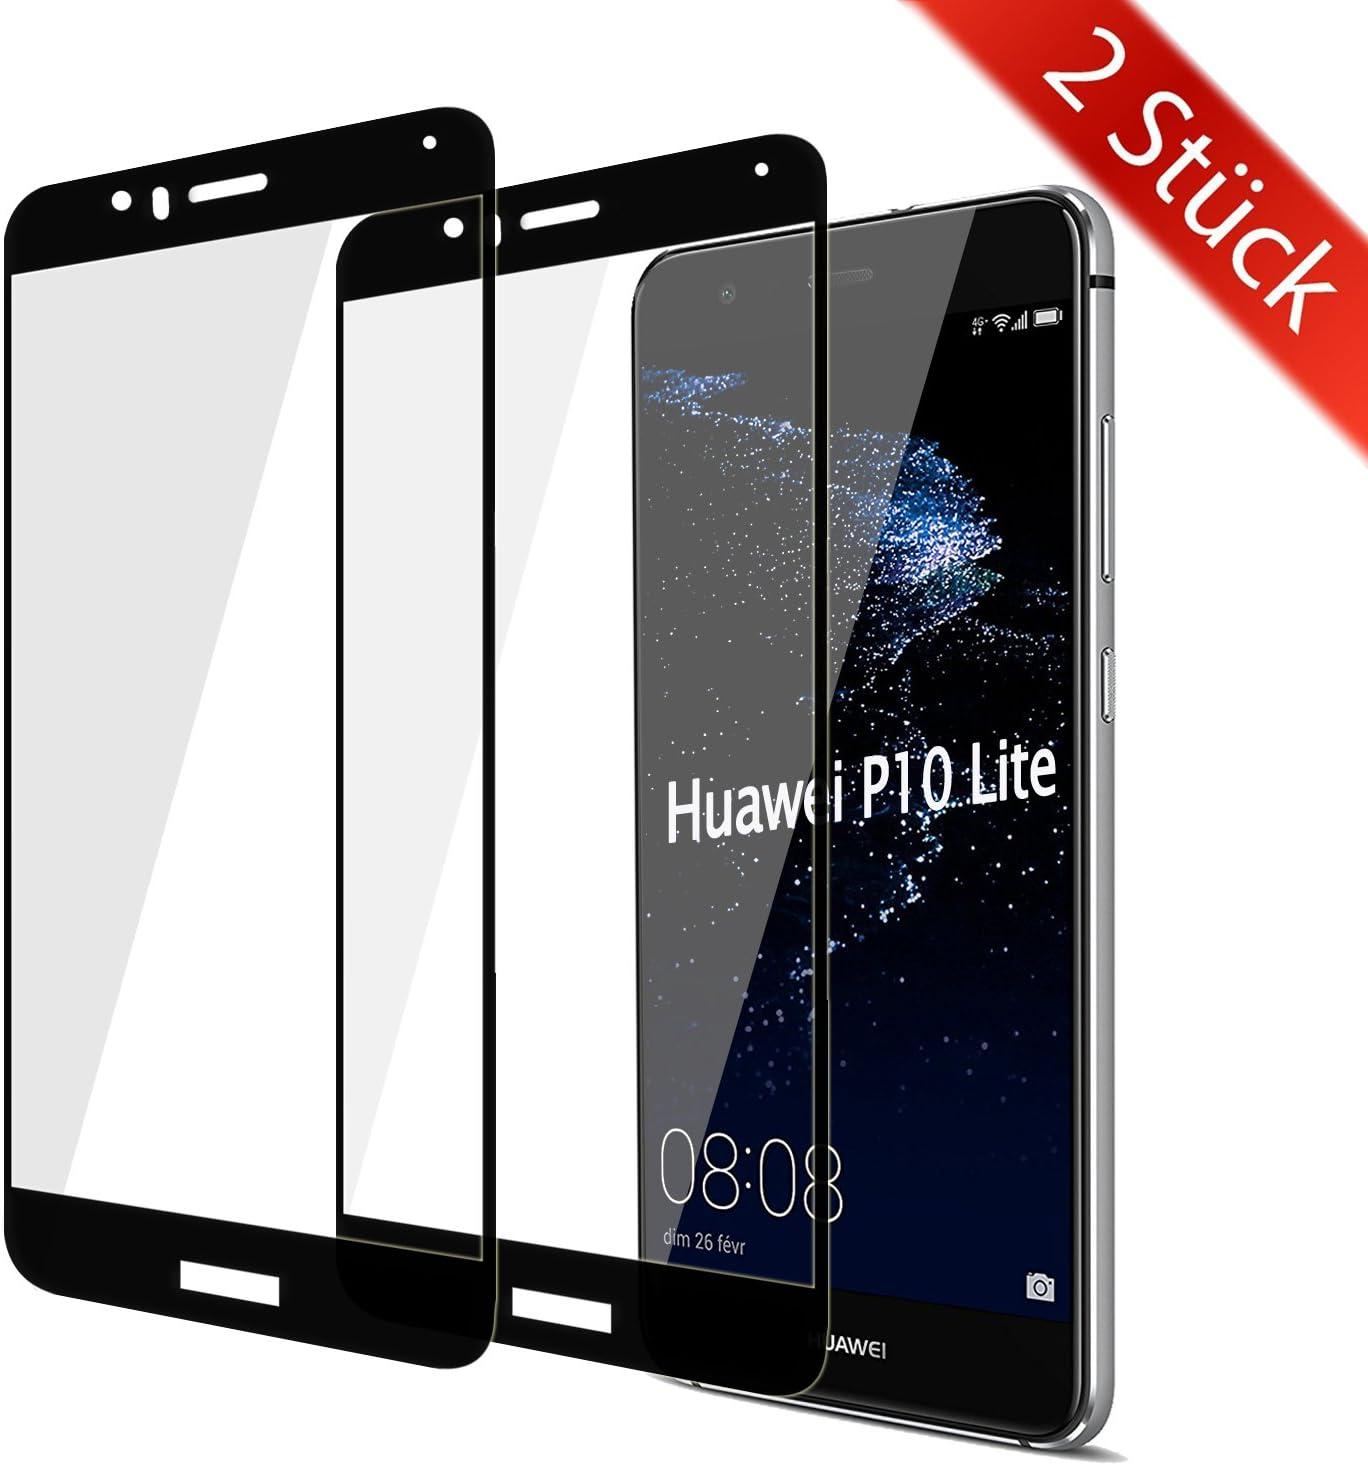 ykooe – Protector de Pantalla para Huawei P10 Lite, Cristal ...